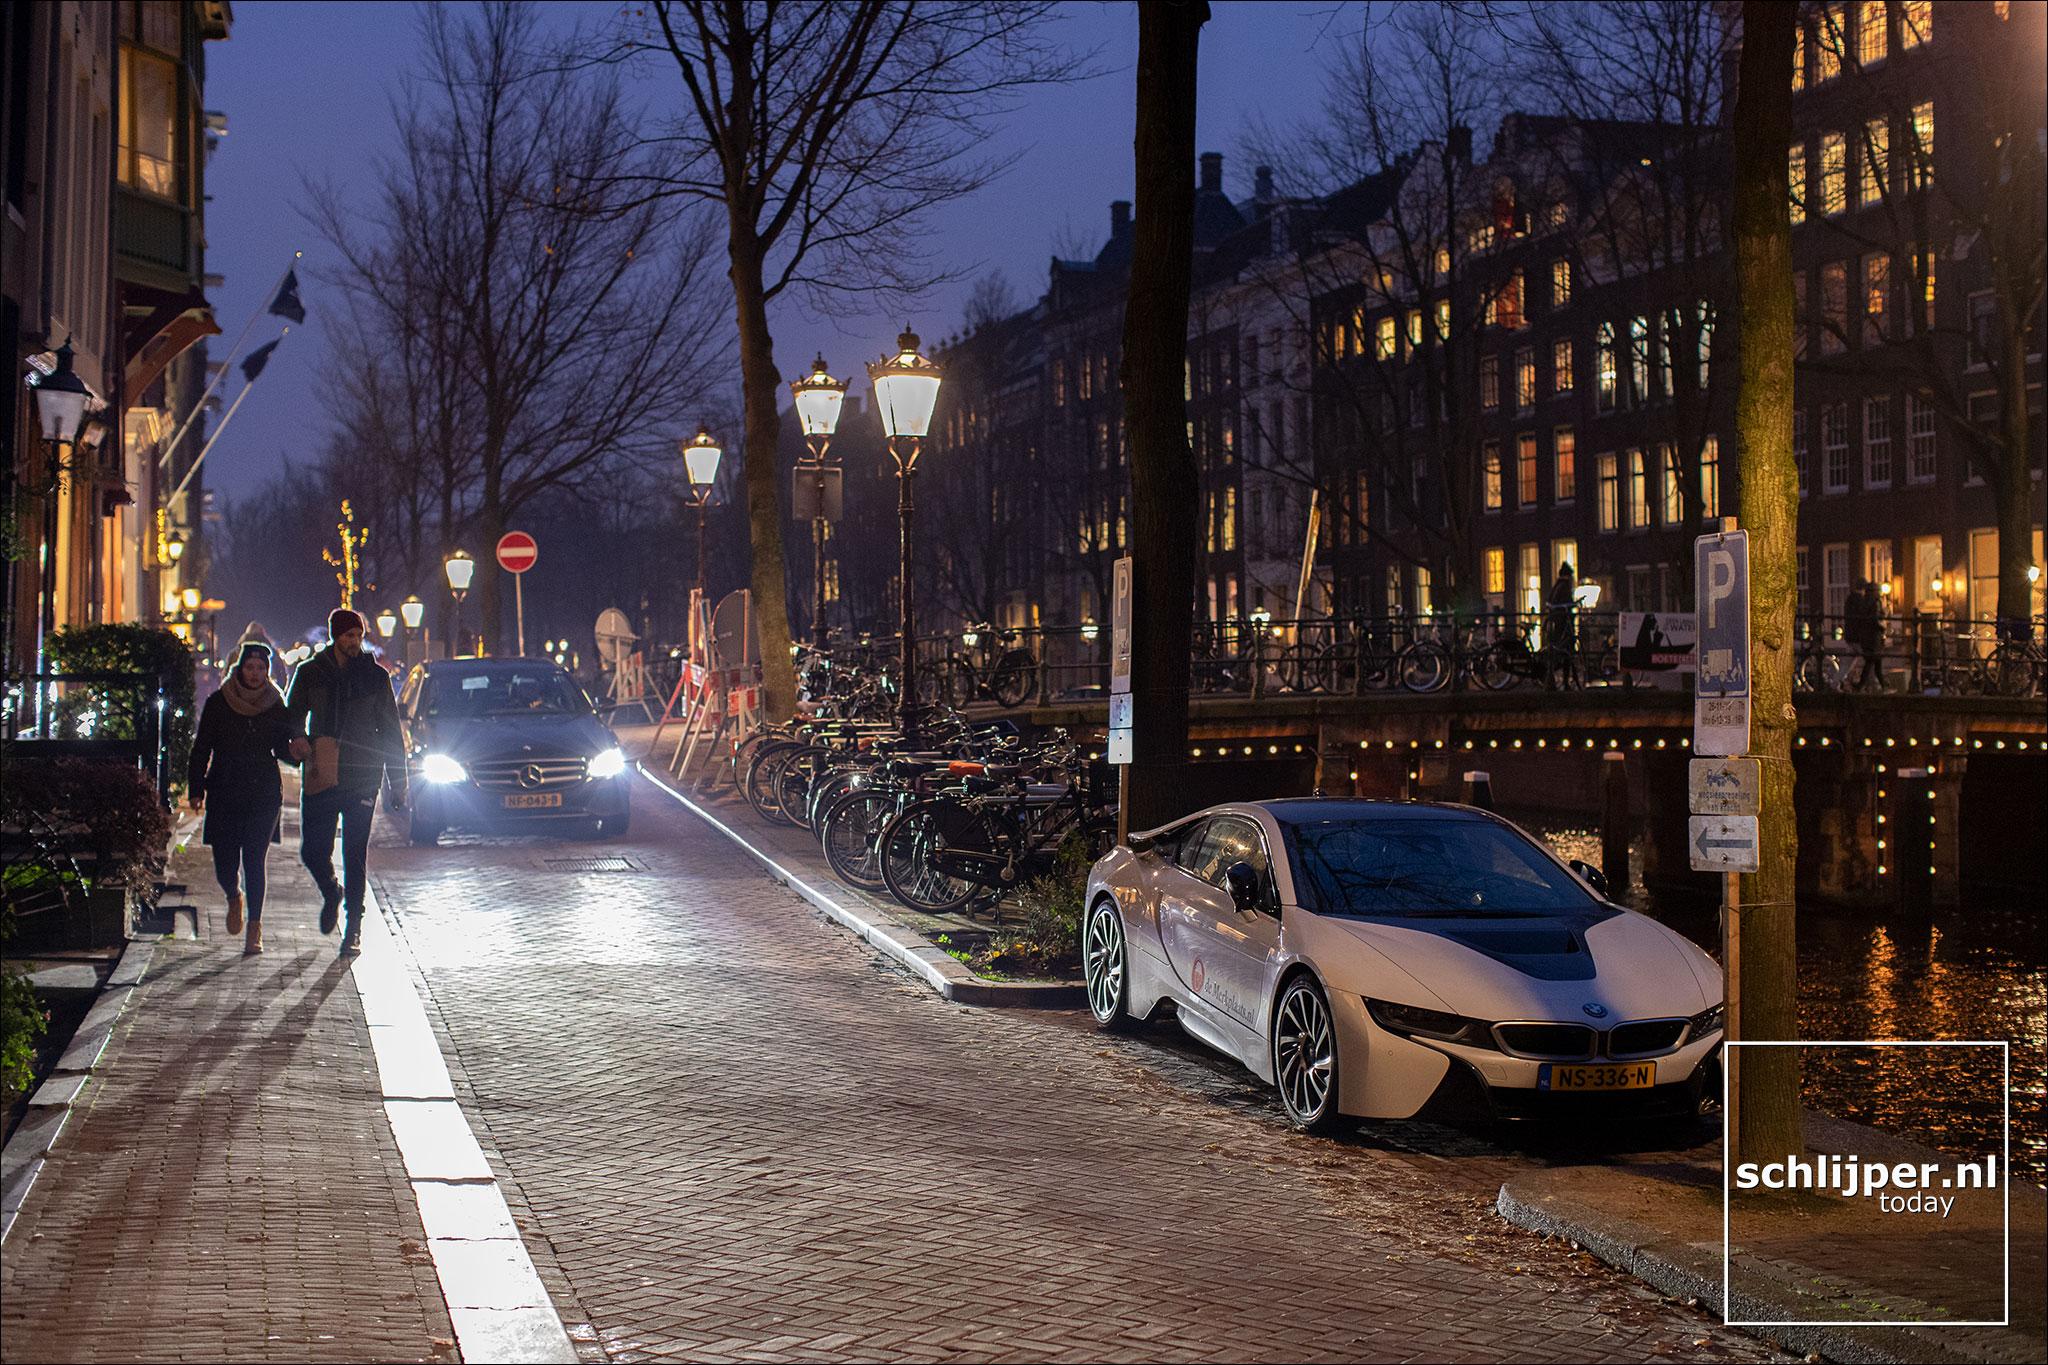 The Netherlands, Amsterdam, 5 december 2019